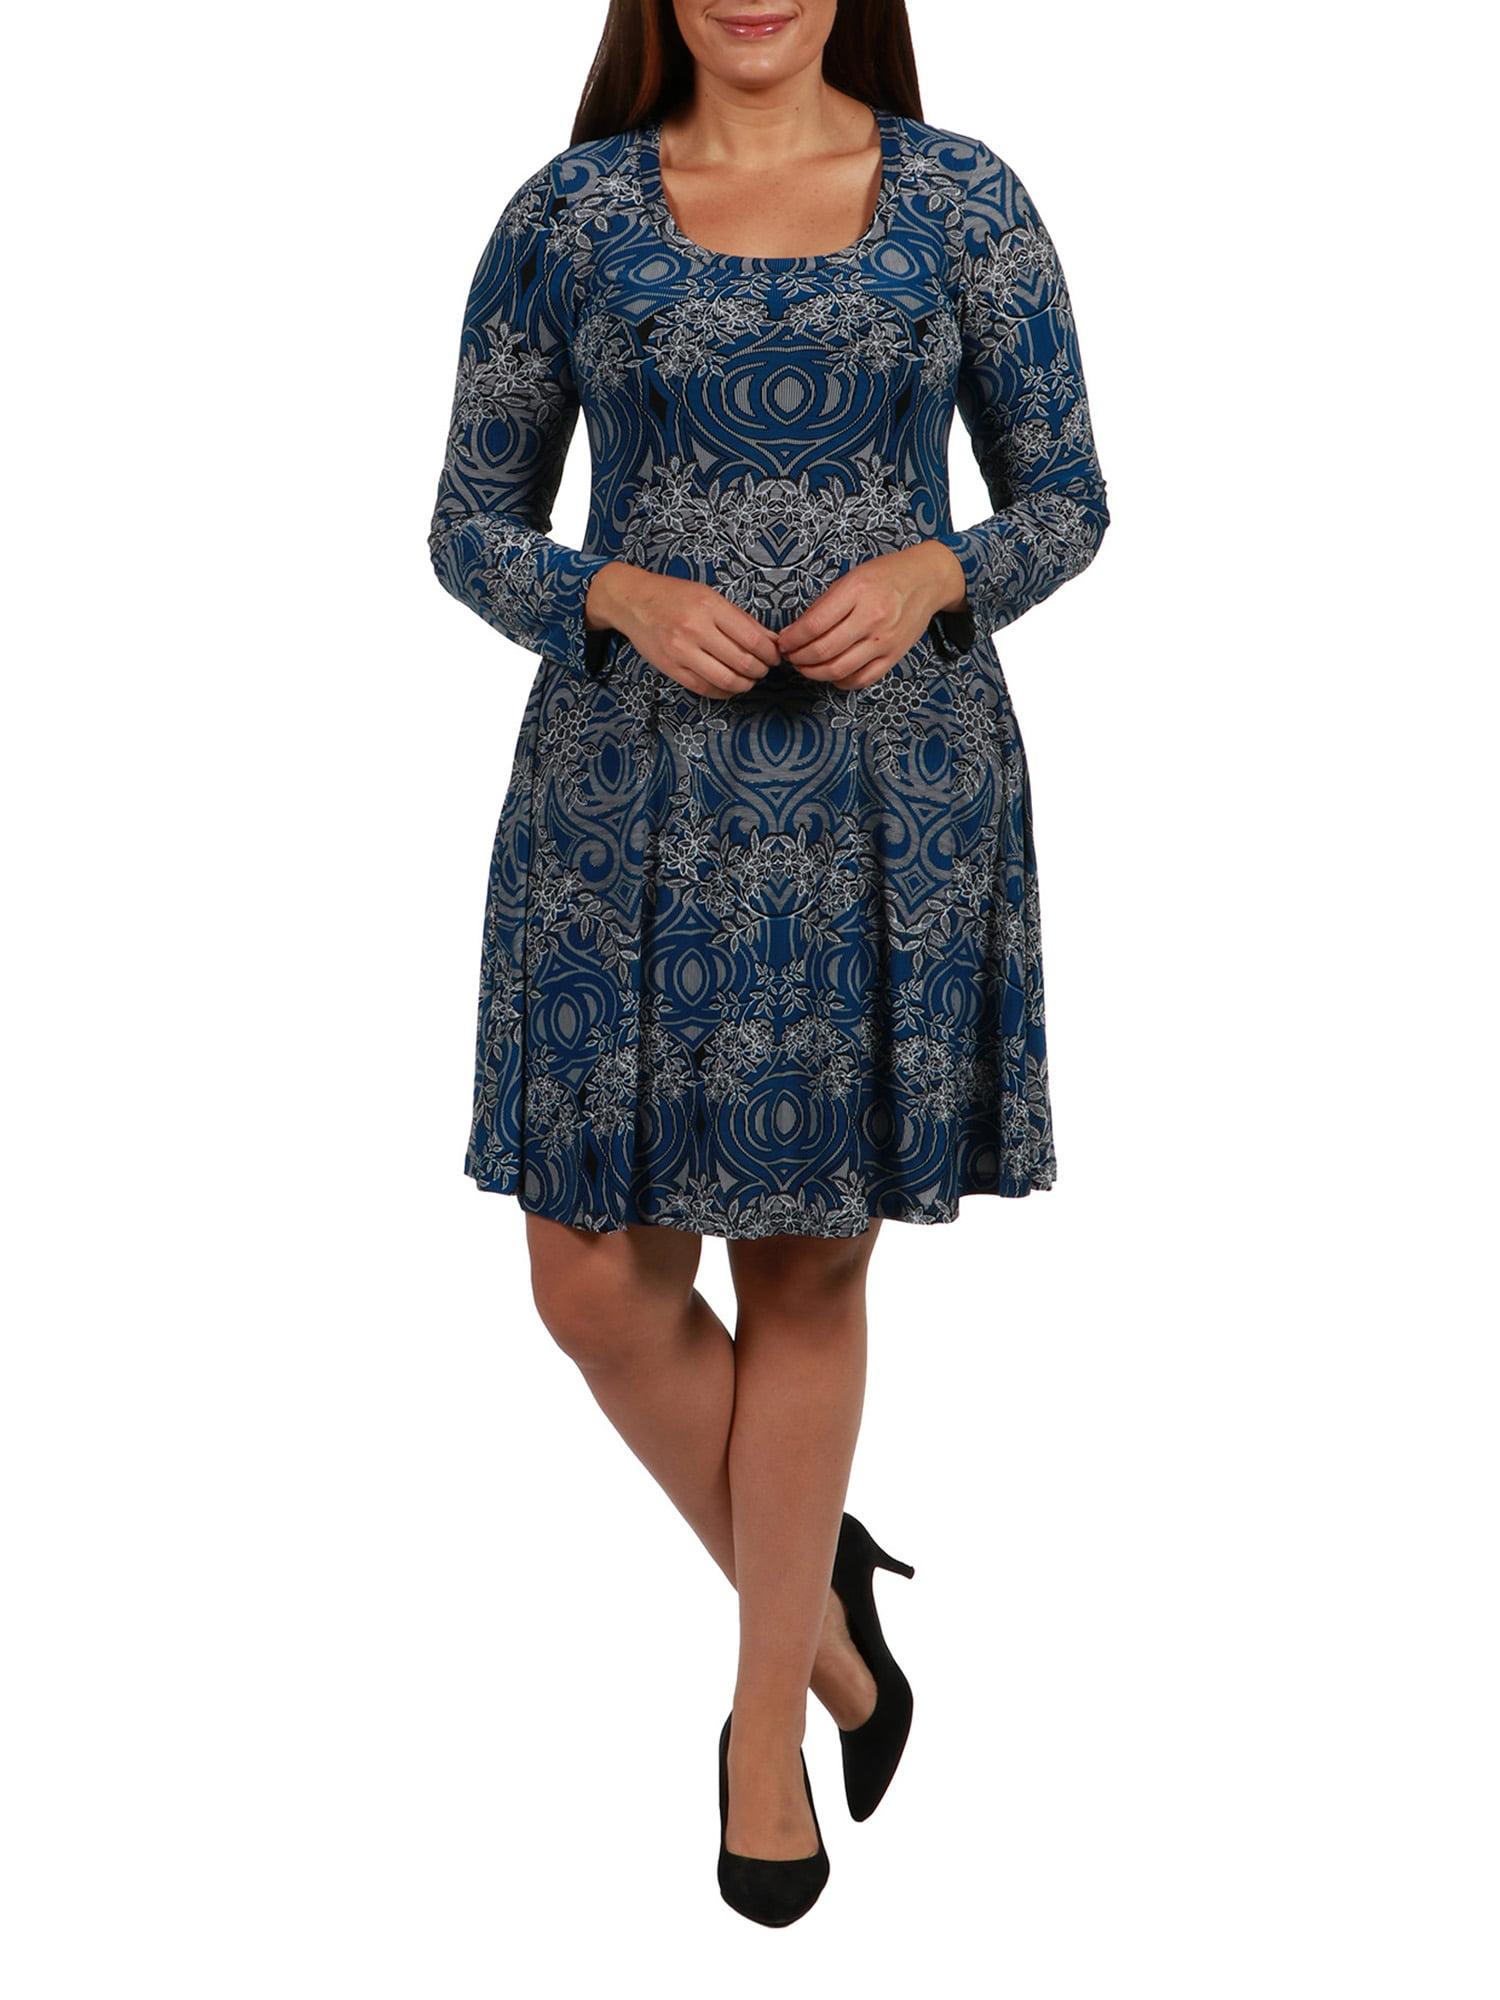 24/7 Comfort Apparel - London Plus Size Dress - Walmart.com